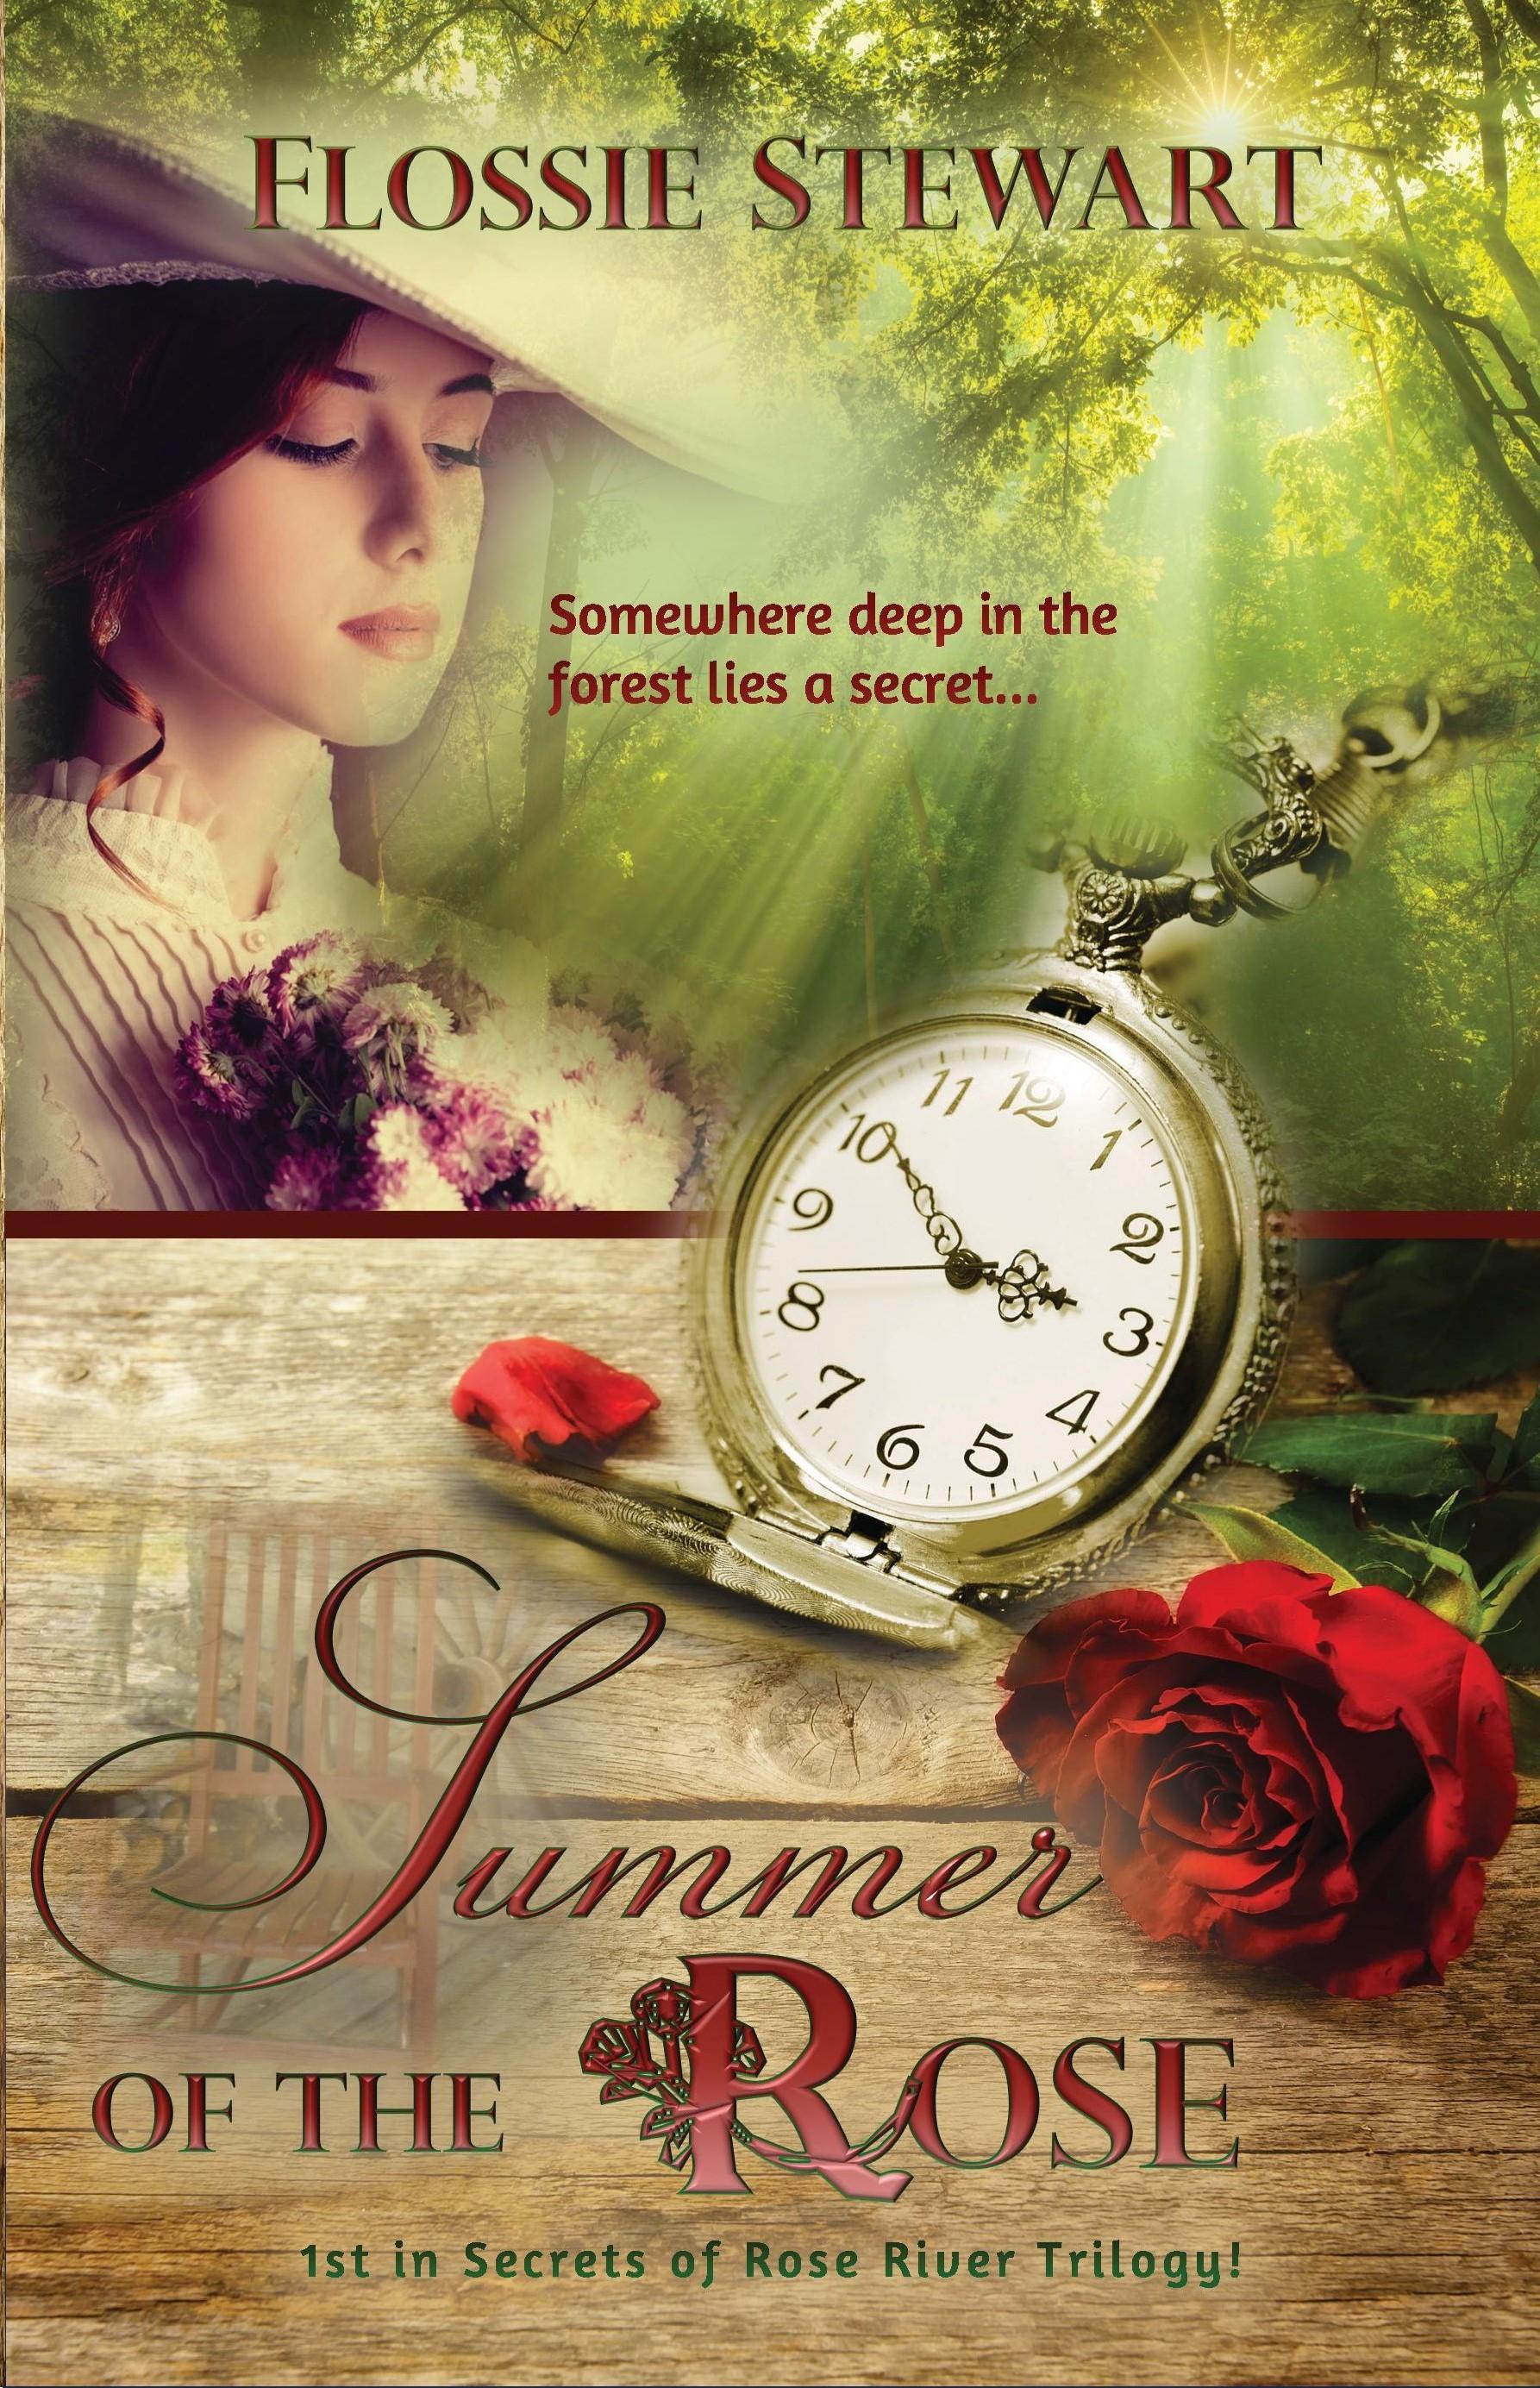 !SummeroftheRose_Bk1_5-27_KindleCvr